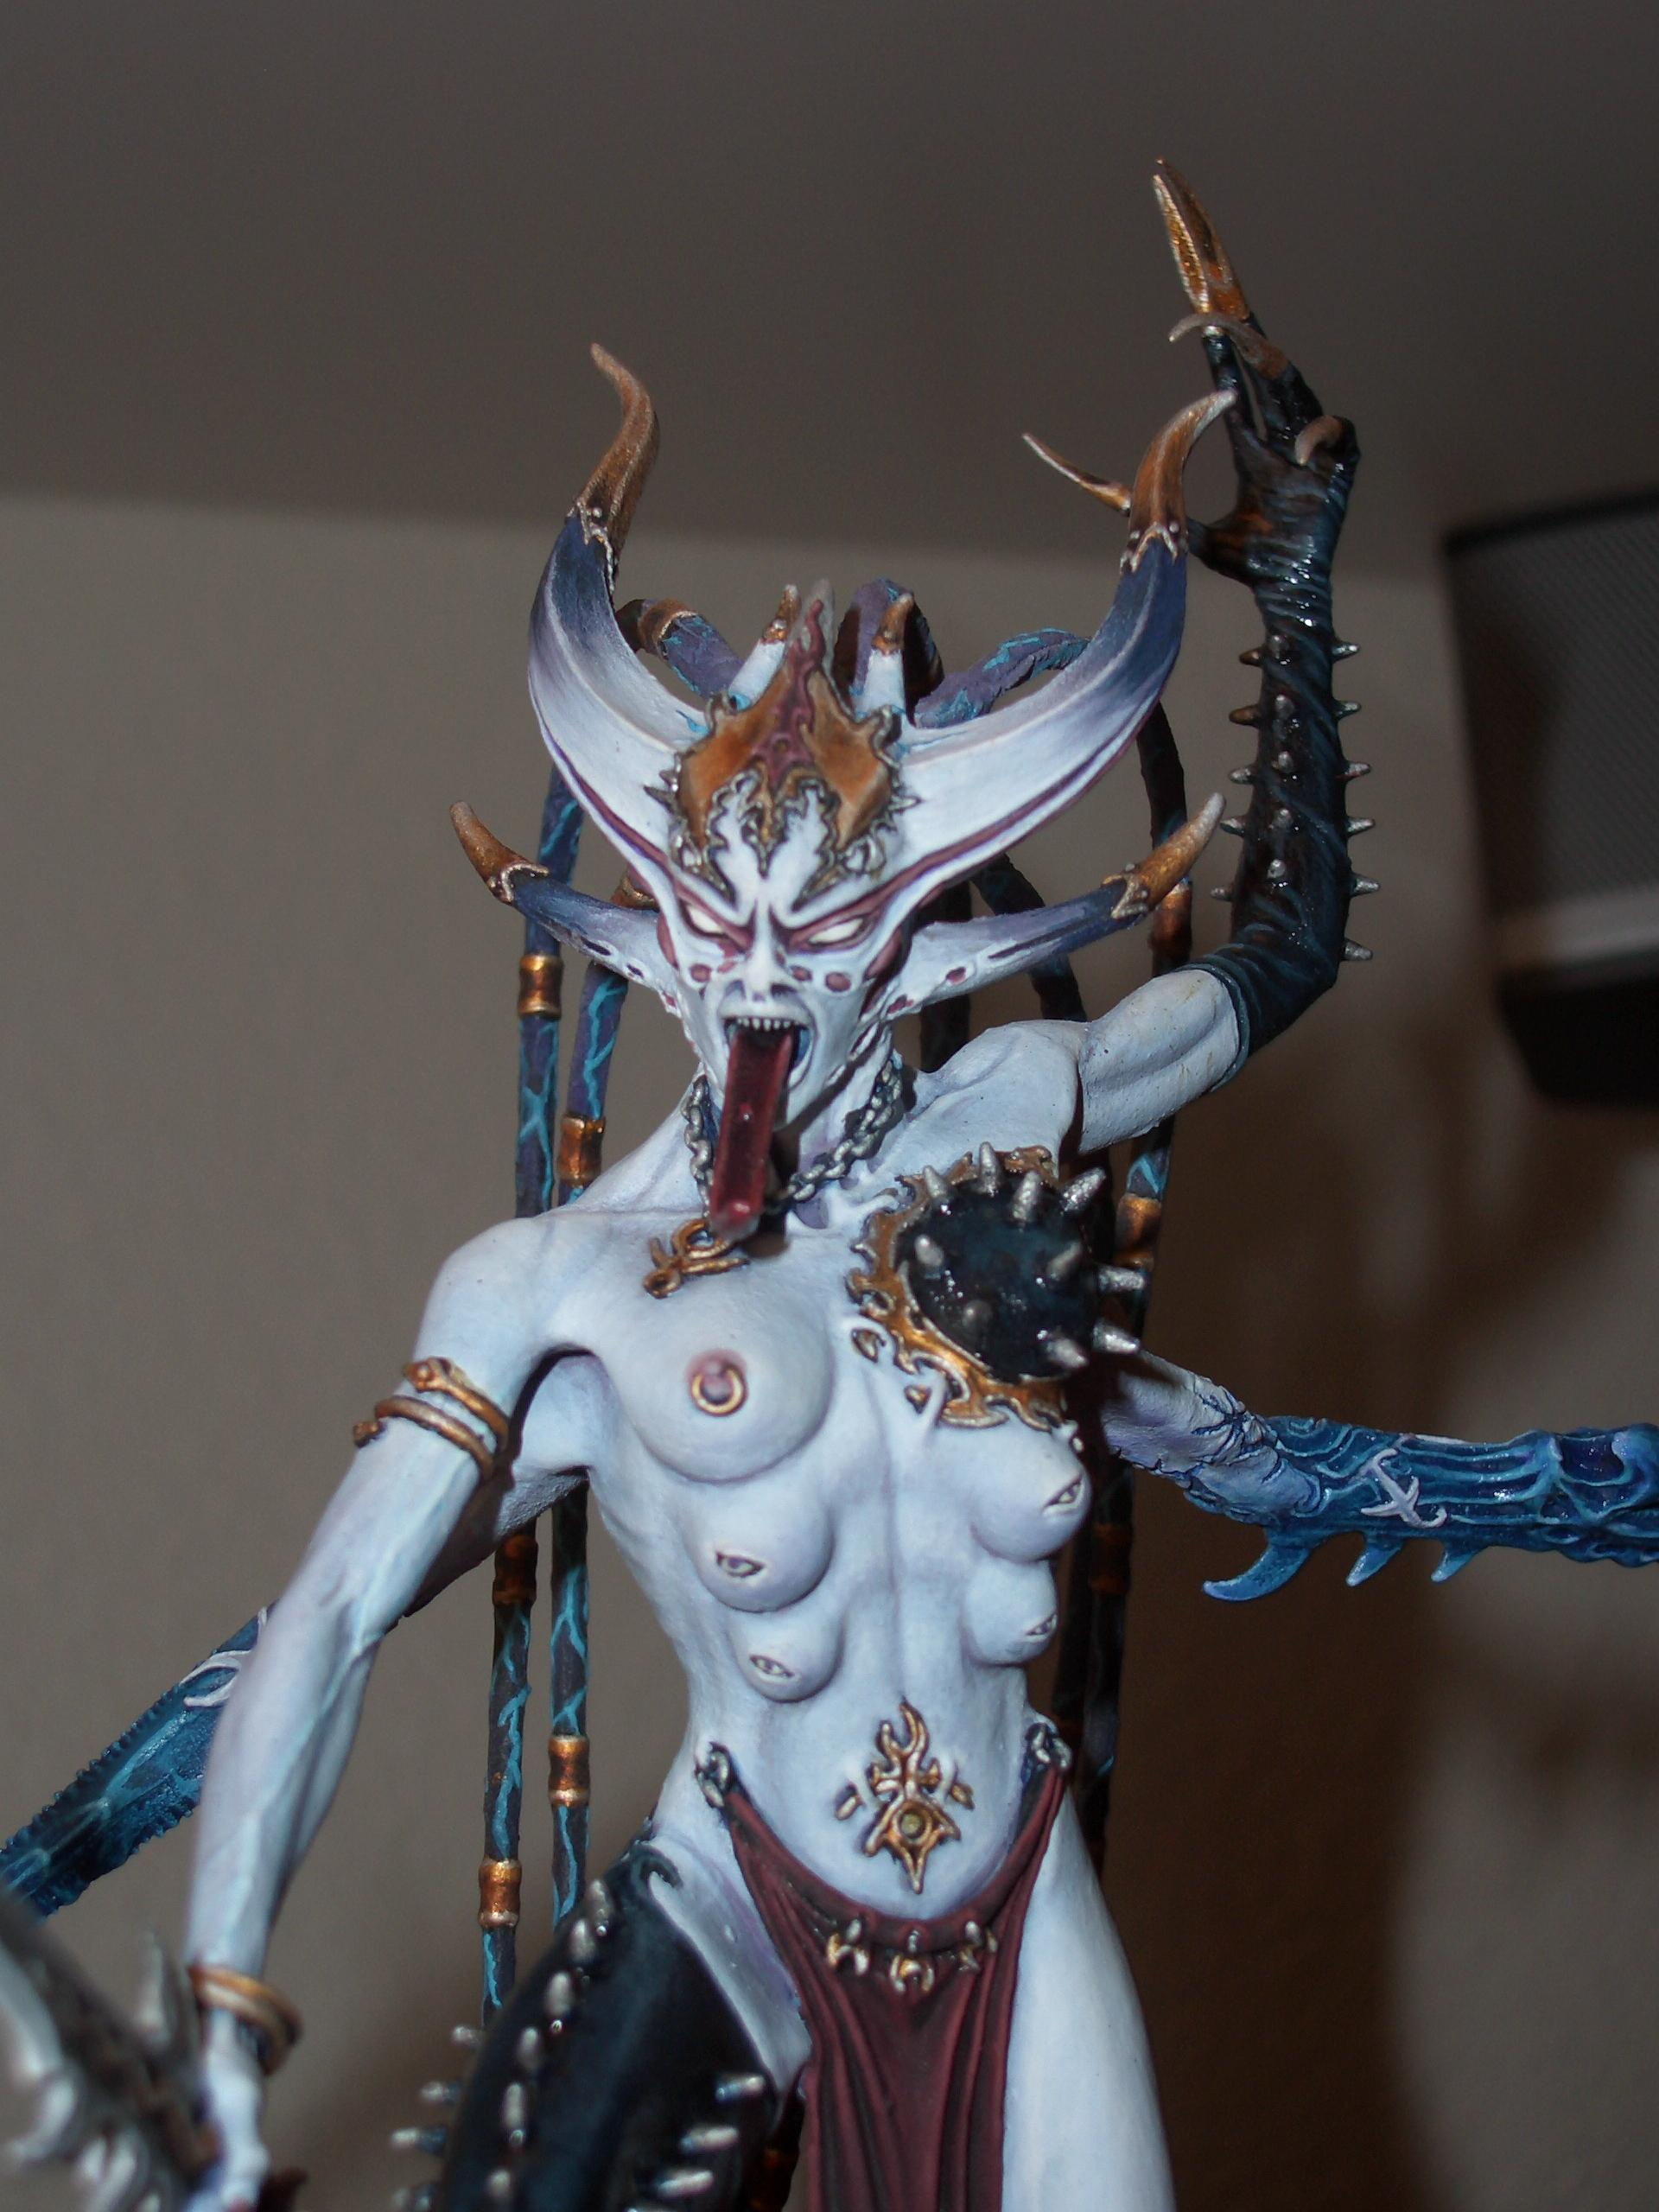 Chaos, Chaos Daemons, Daemons, Forge World, Keeper Of Secrets, Slaanesh, Warhammer Fantasy